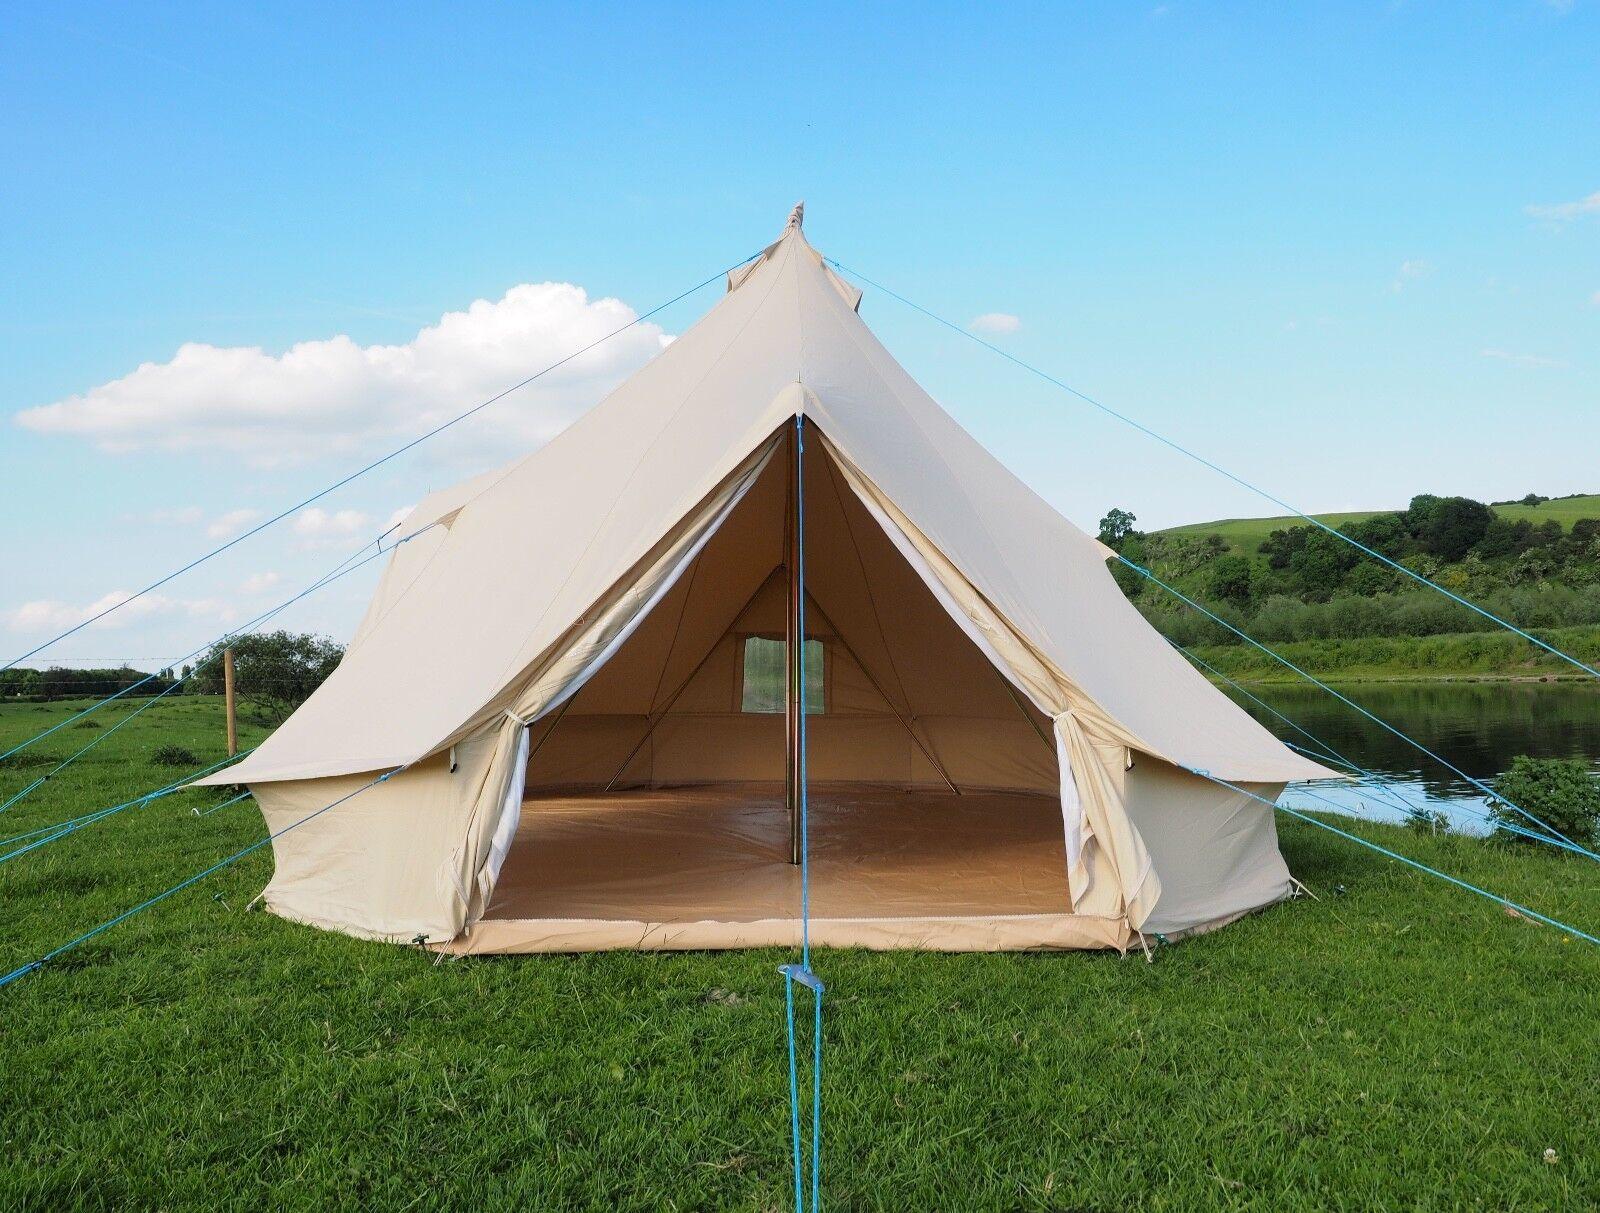 Emperor Bell Tent 100% Canvas Zipped dans Groundsheet Groundsheet Groundsheet by Bell Tent boutique. 48b1e5